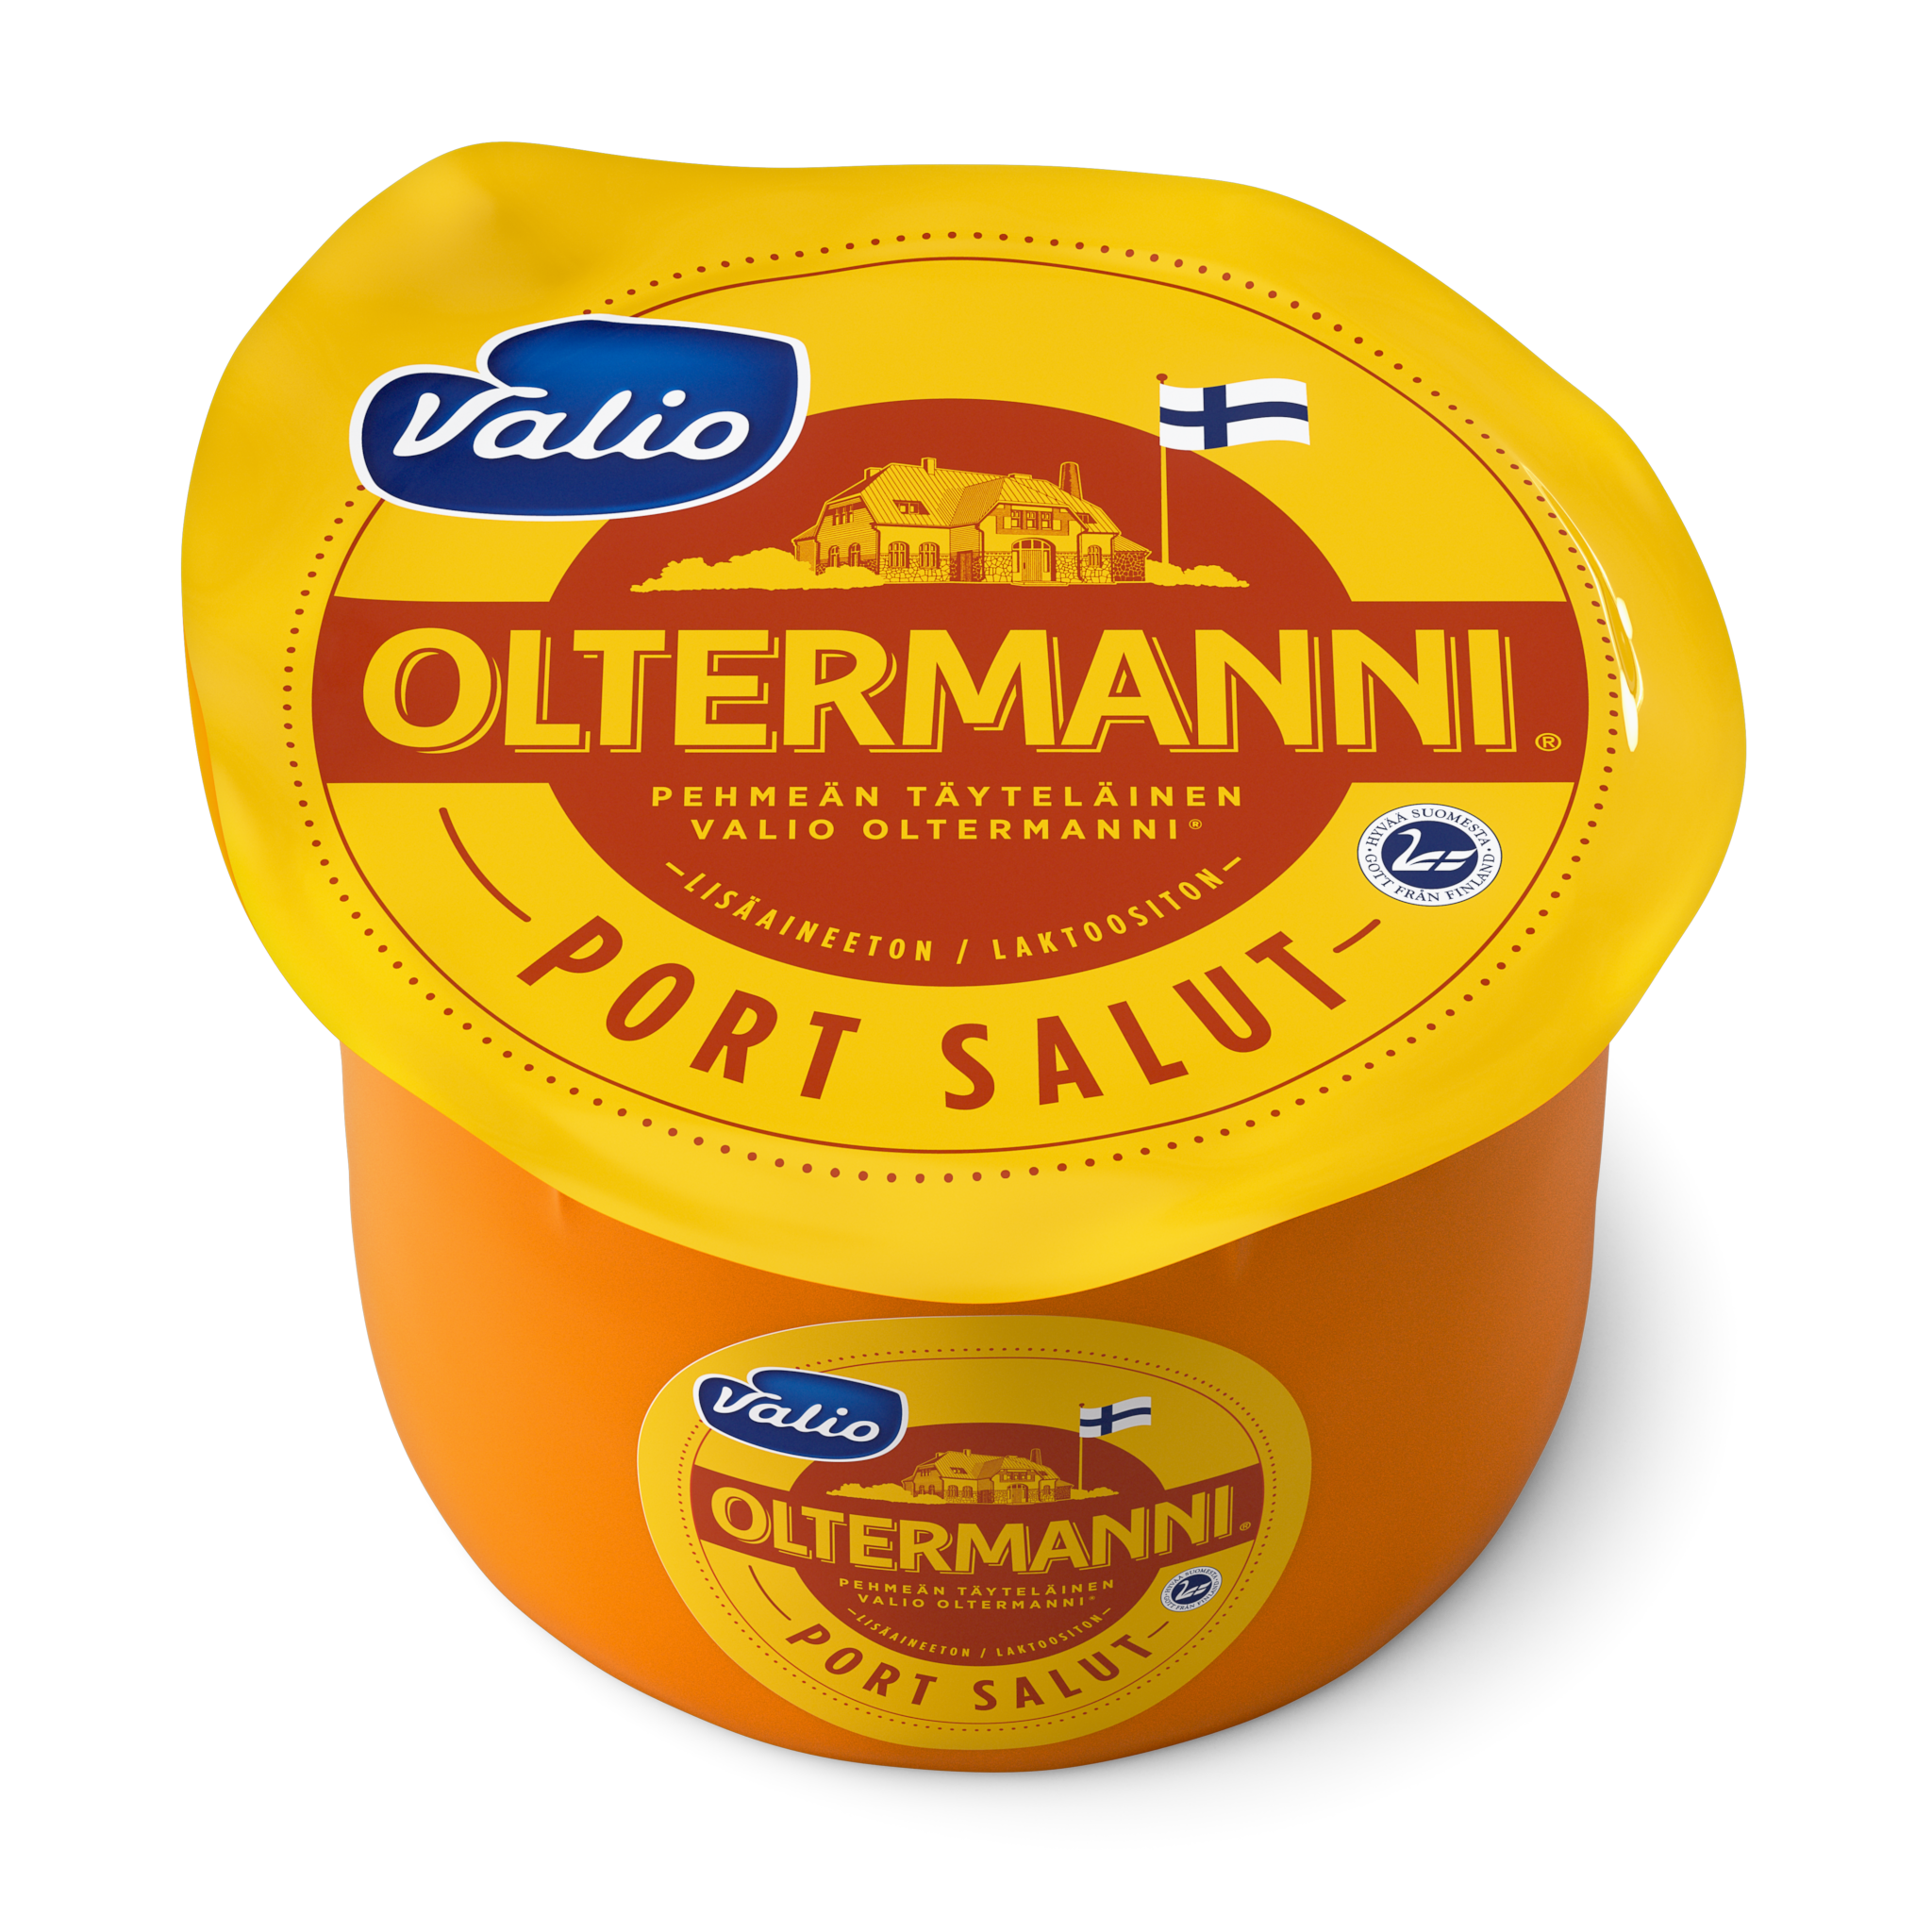 Valio Oltermanni® Port Salut juusto